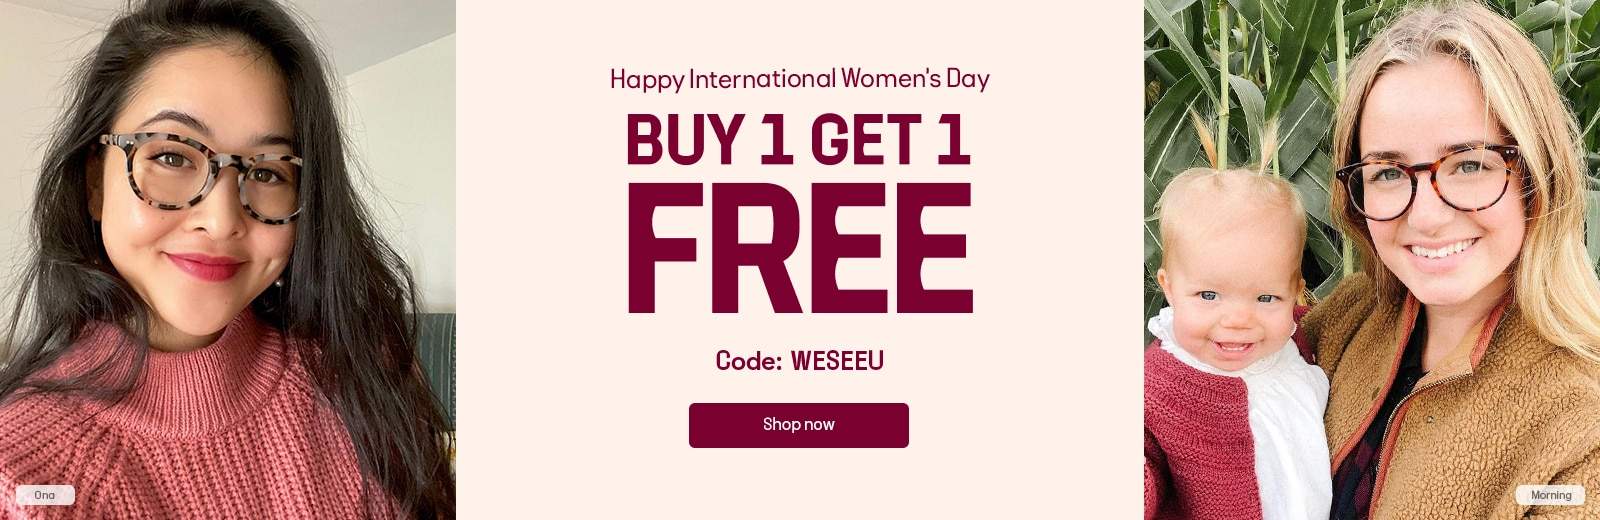 Happy International Women's Day  BUY 1 GET 1 FREE  CODE: WESEEU